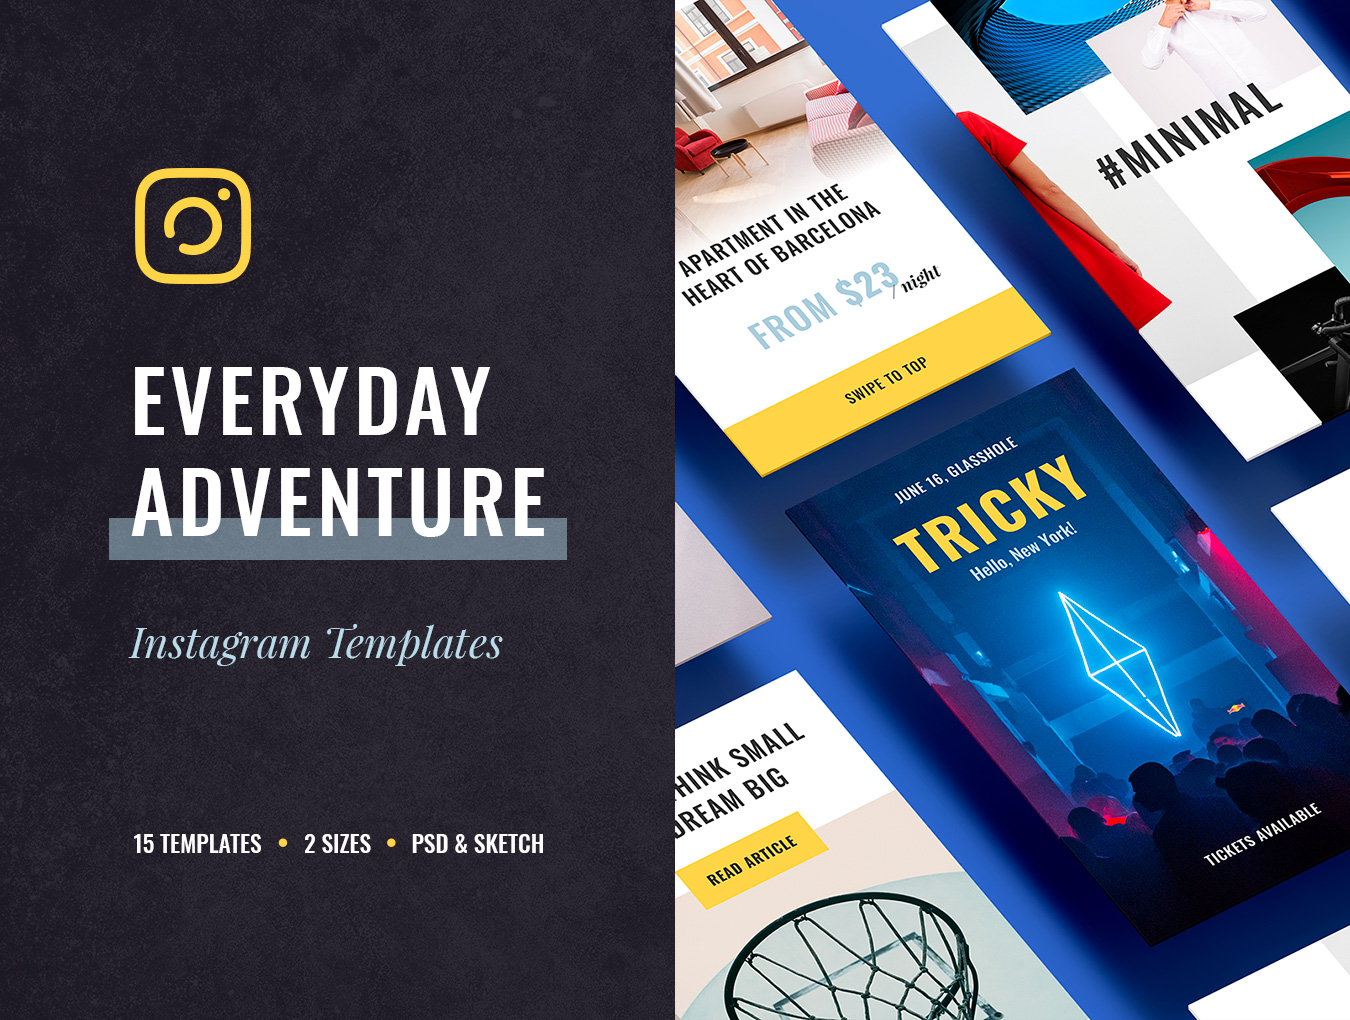 时尚简约风格APP Everyday Instagram Templates